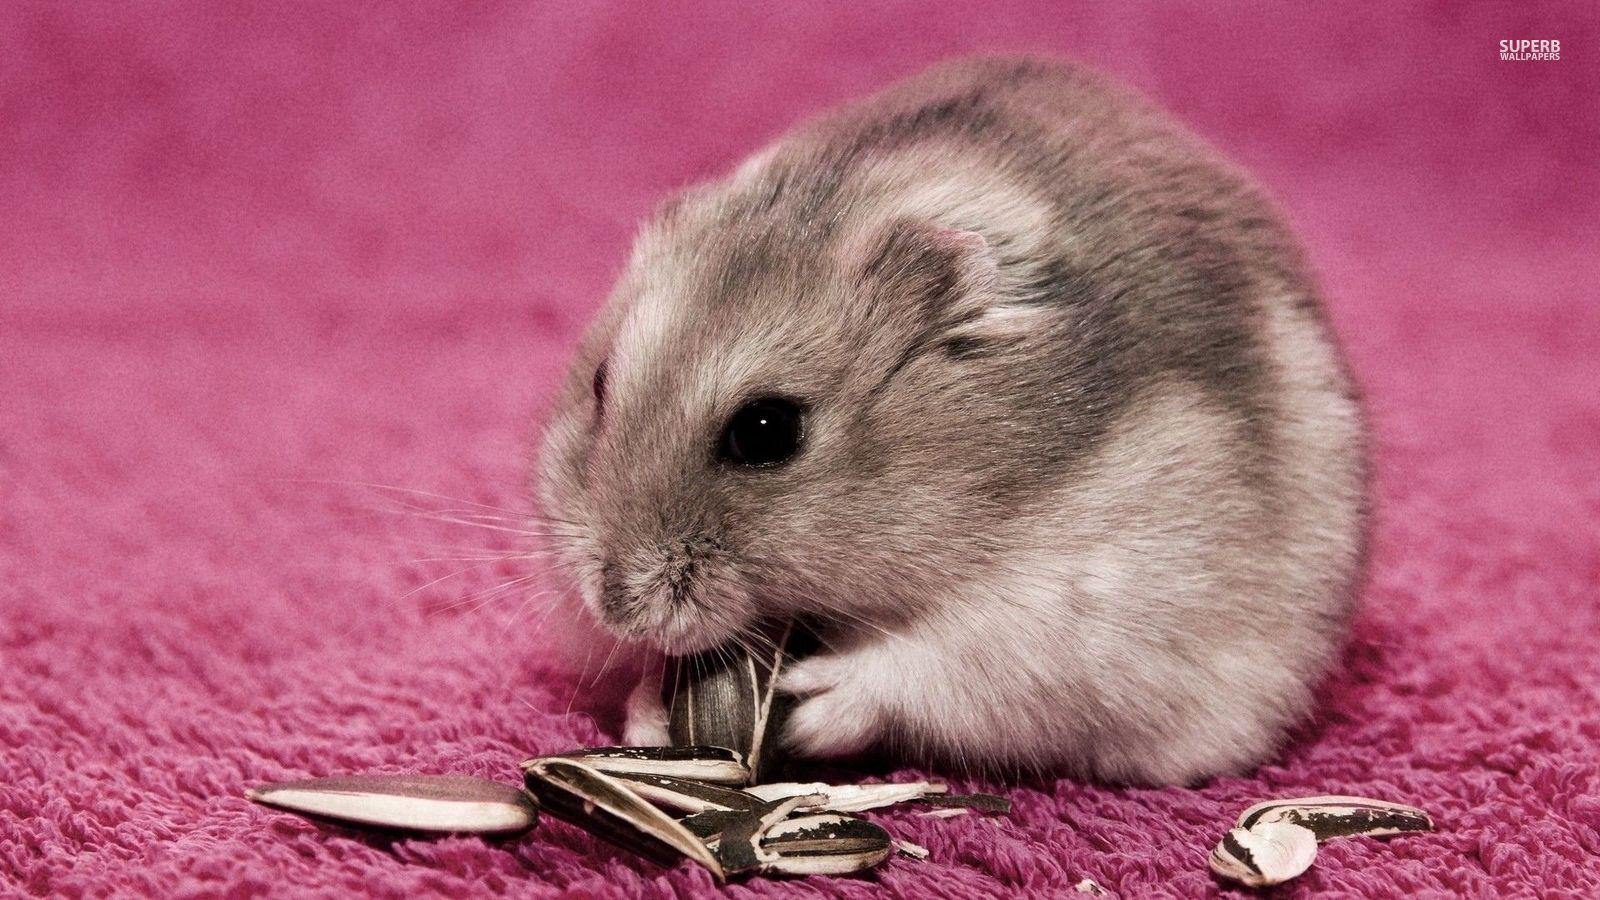 Hamster - Animals Wallpaper (38674647) - Fanpop